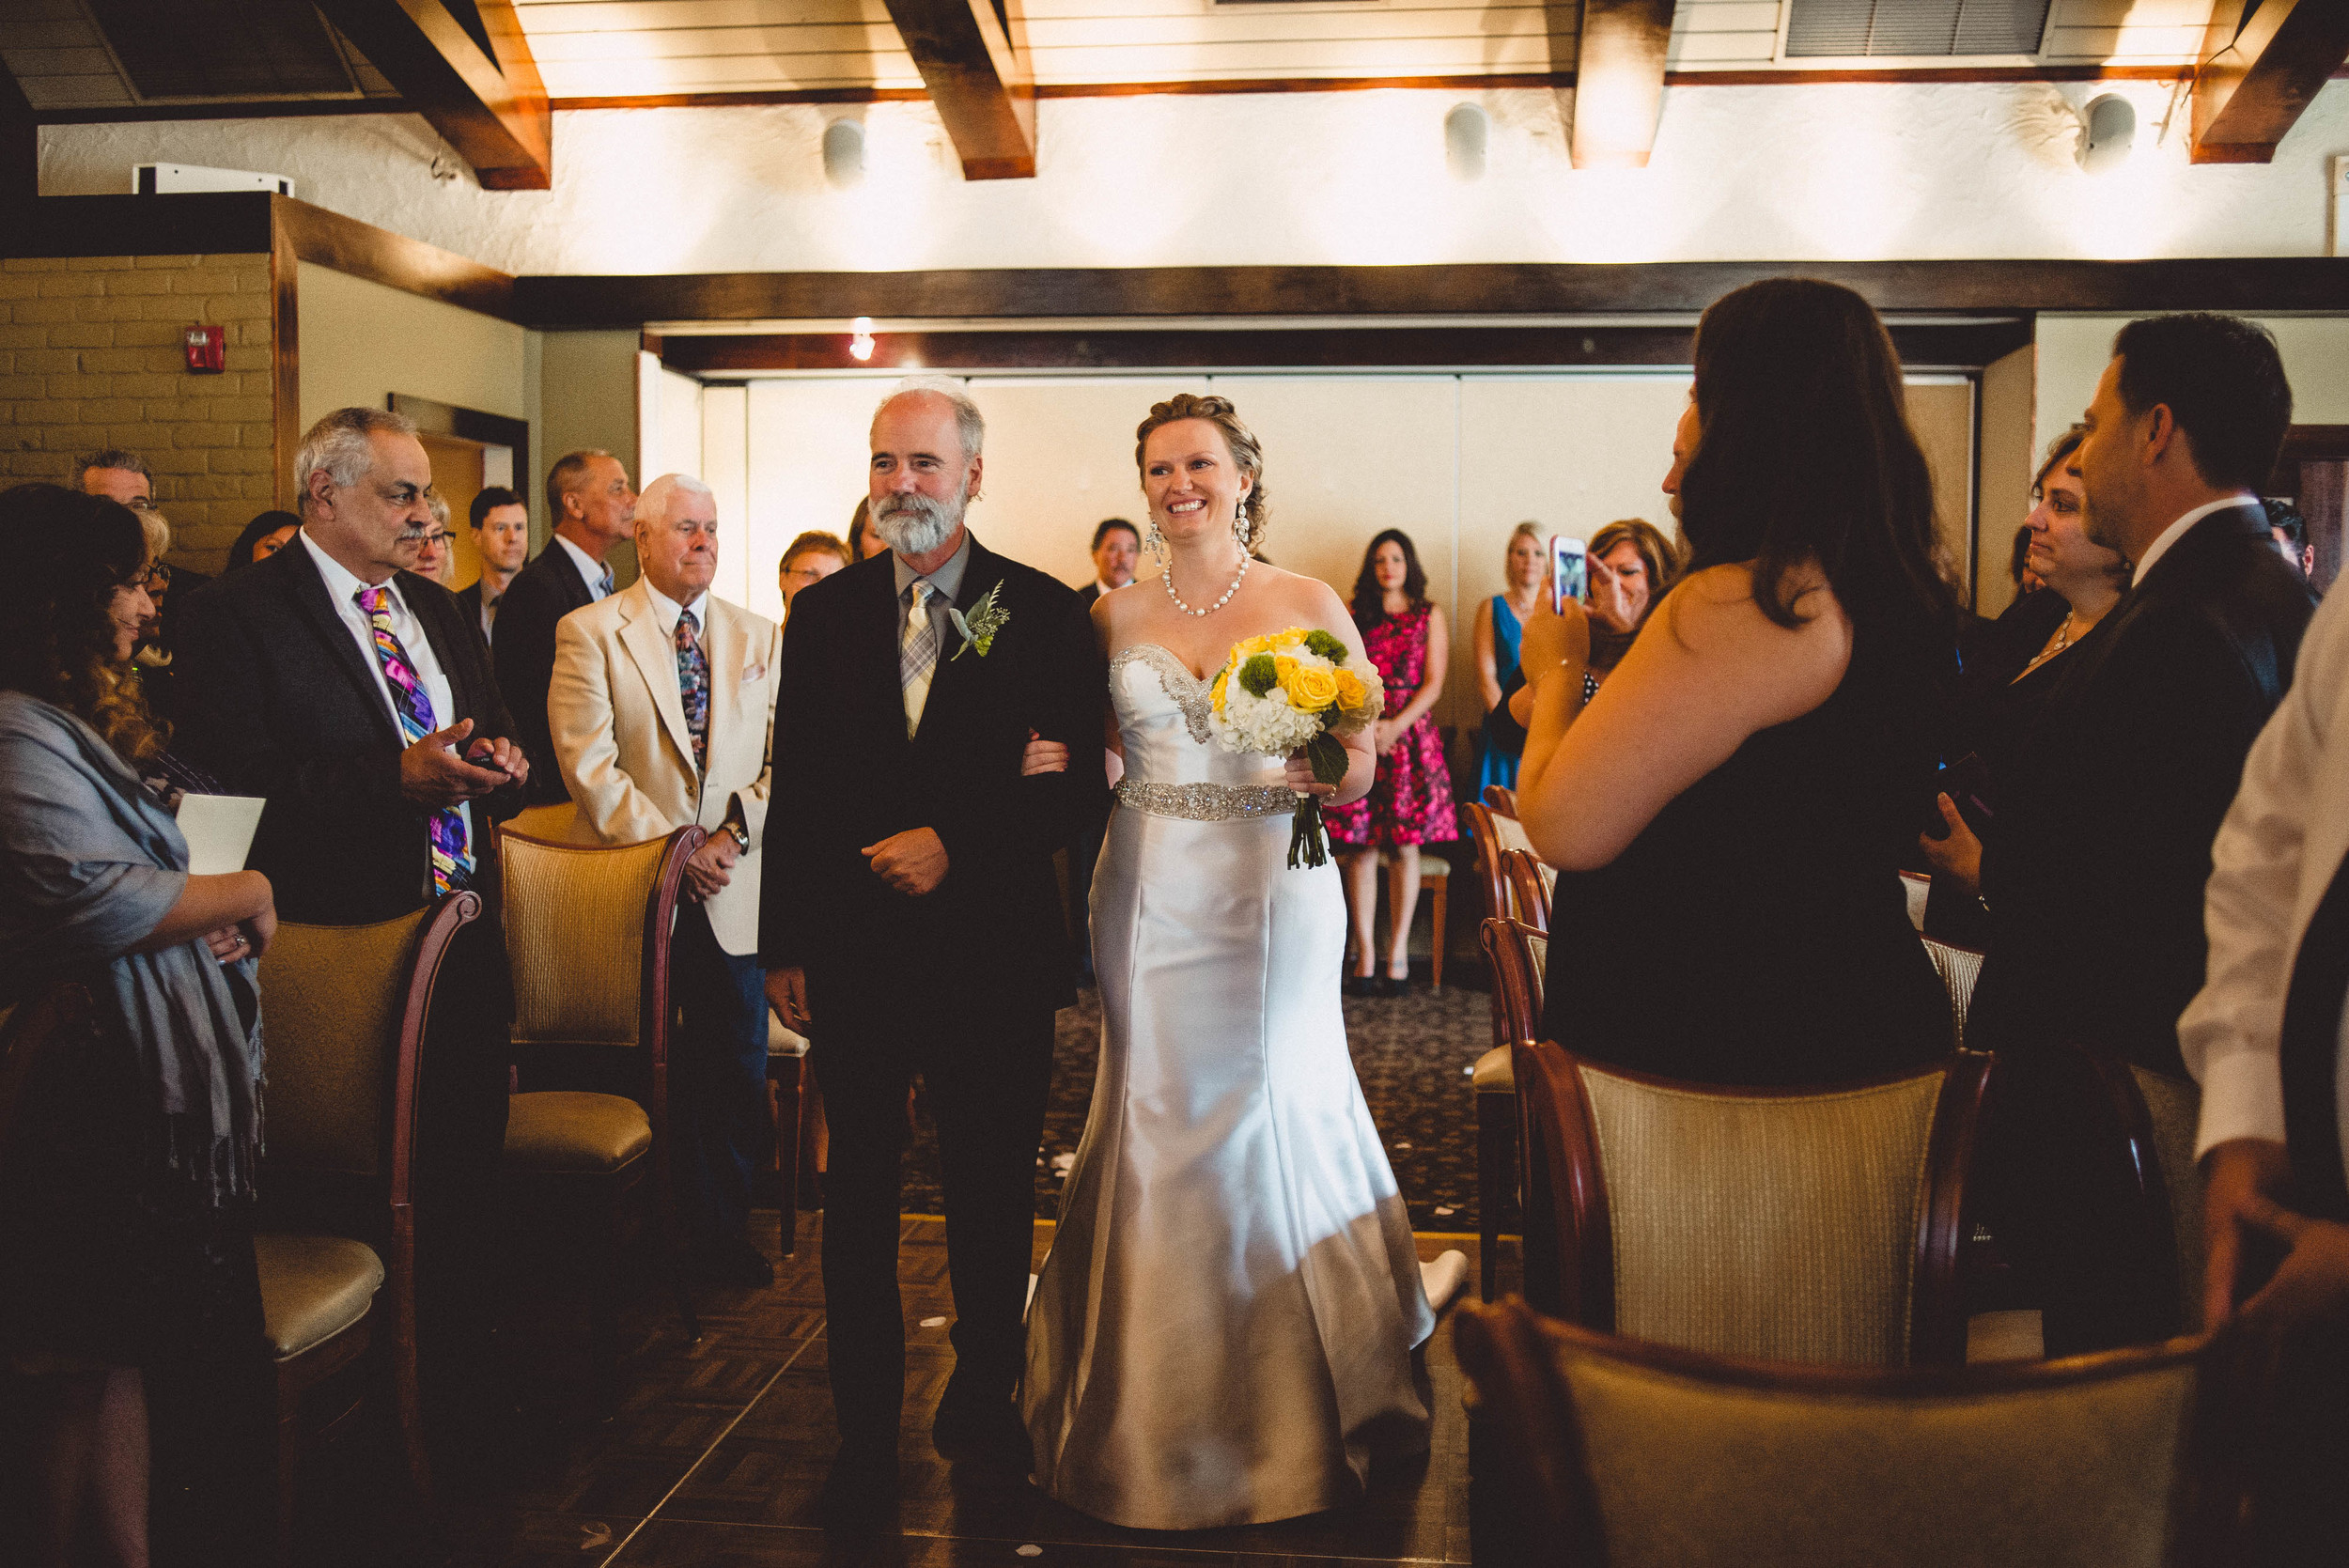 Matt and Shannon Wedding-20160730-17-32-26.JPG